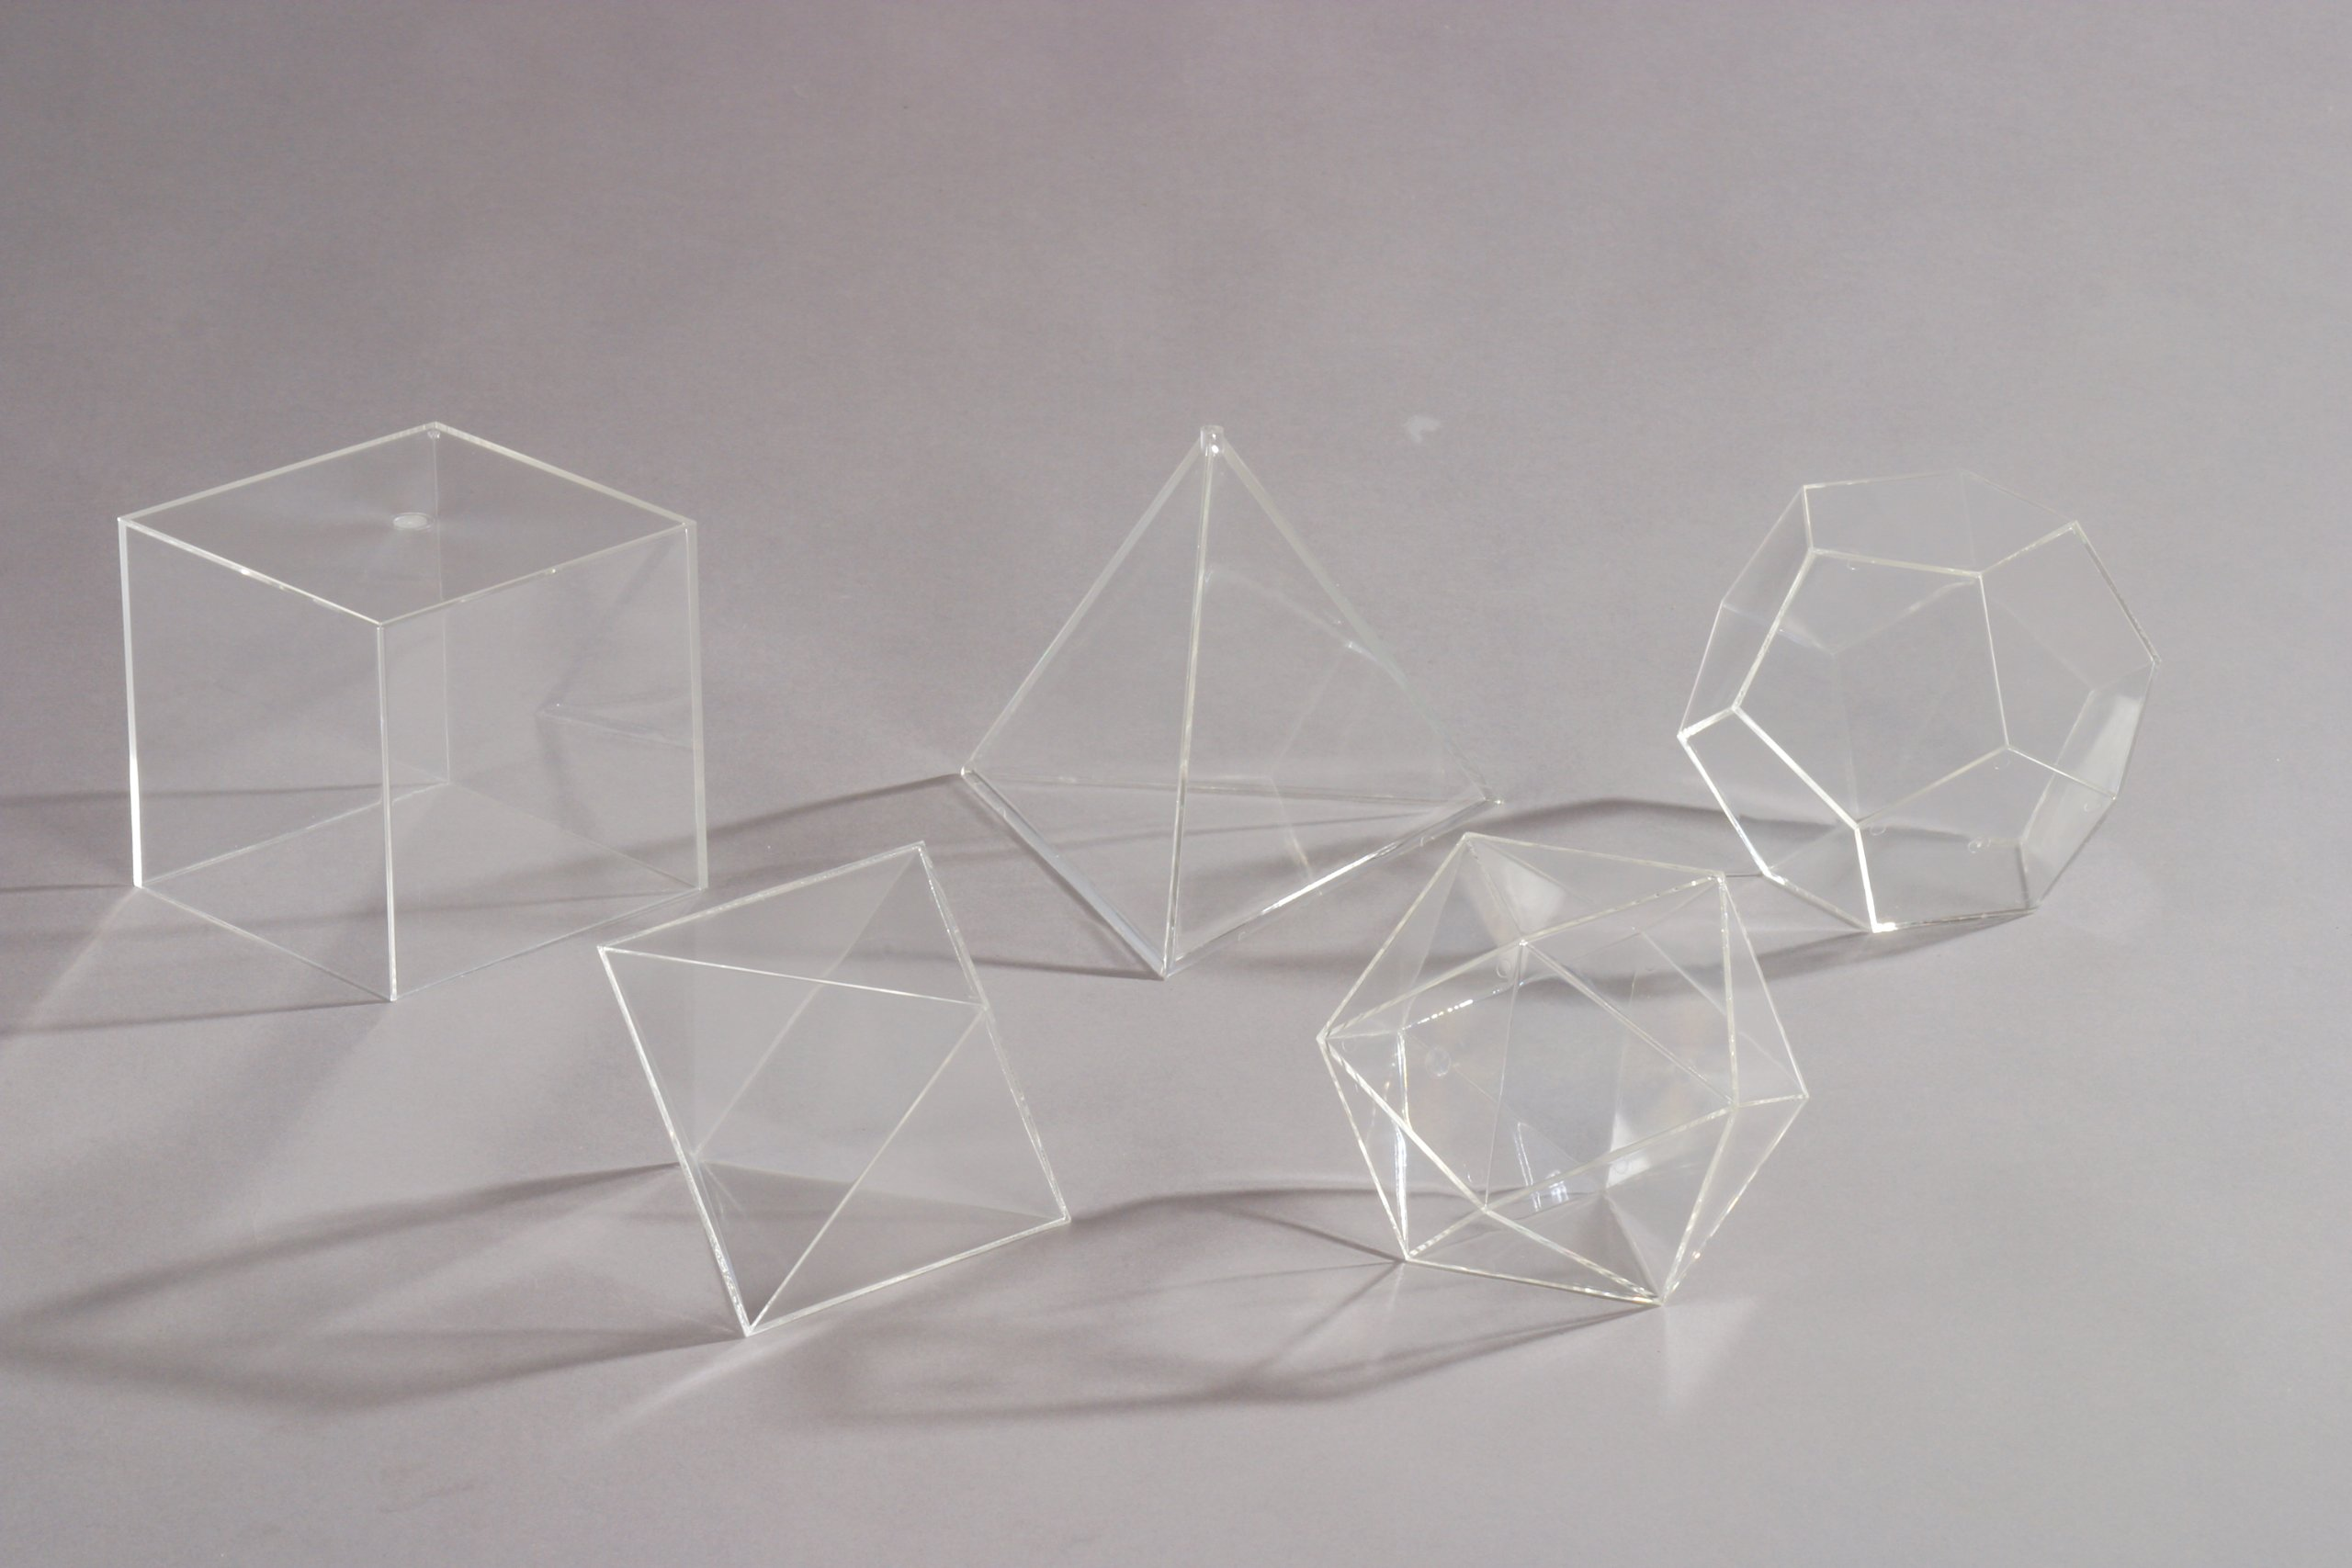 Platonic body made of plexiglass by GH Günter Herrmann